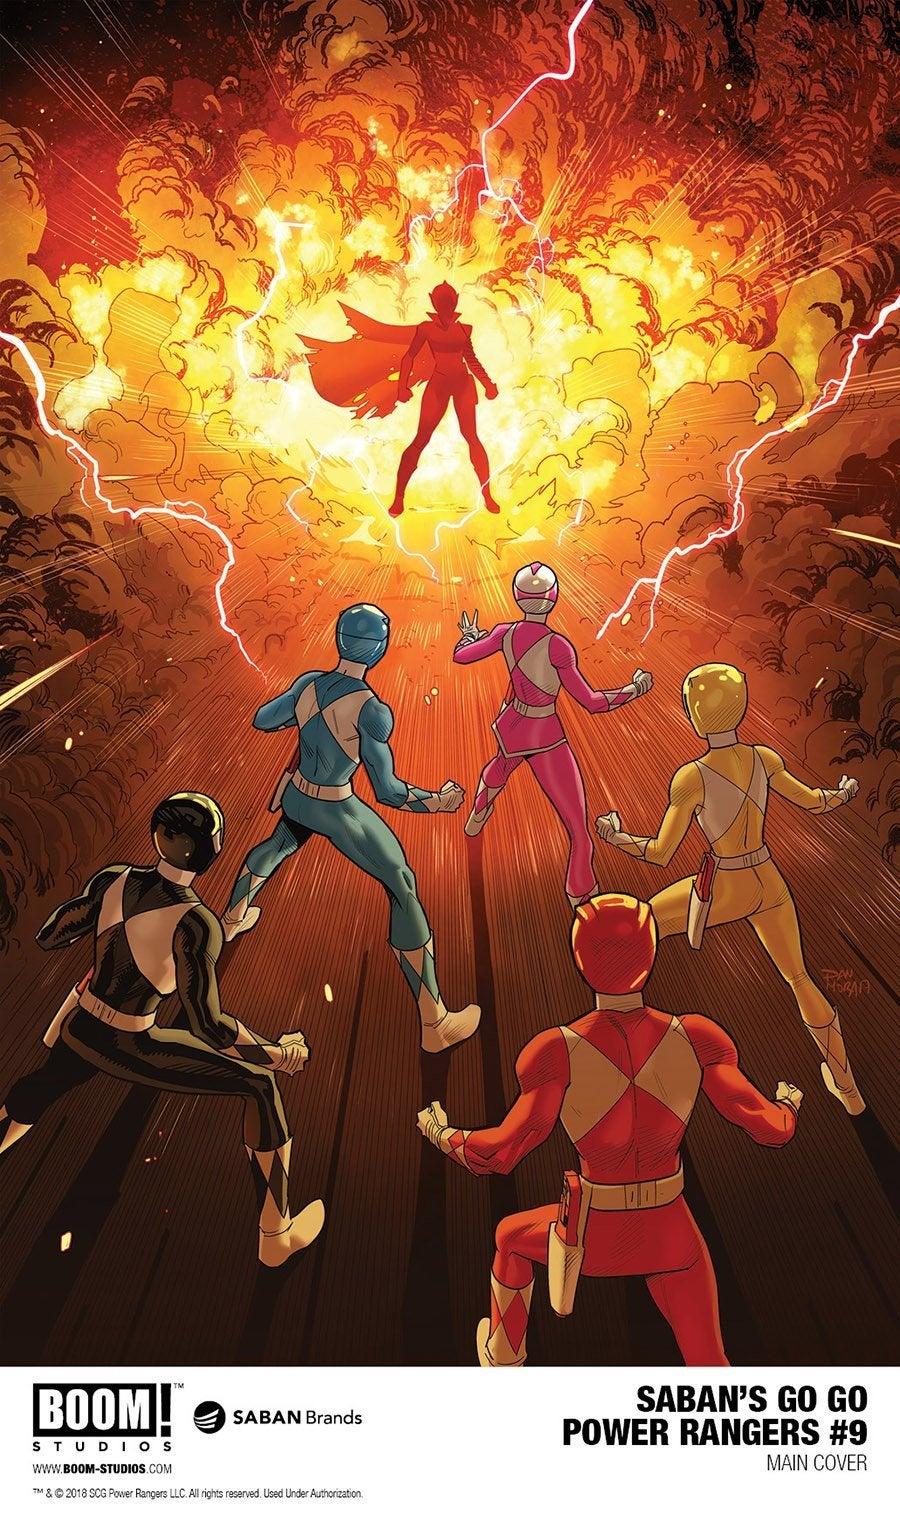 Go-Go-Power-Rangers-009-Main-PROMO